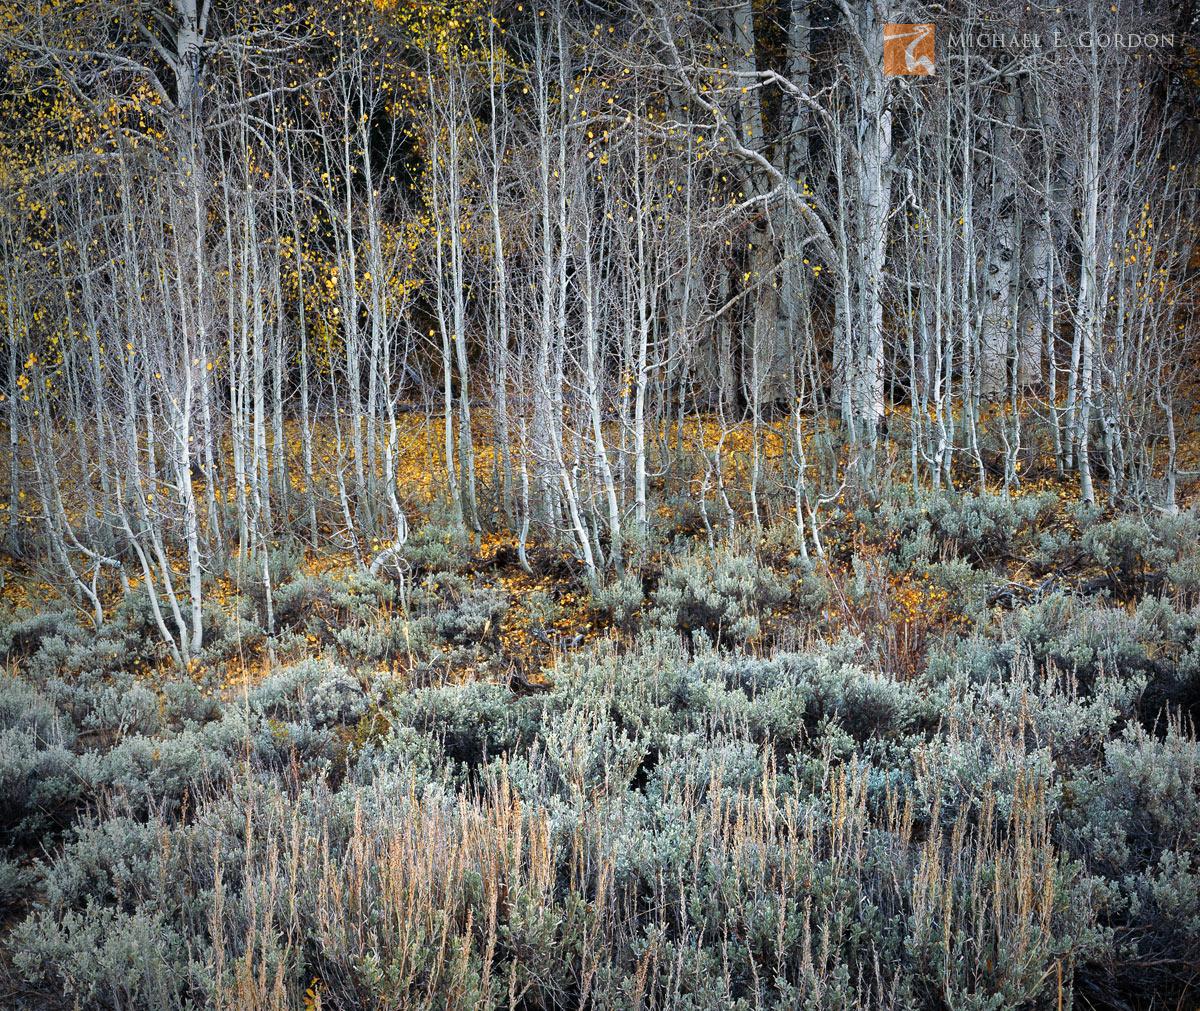 complementary, Big Sagebrush, Artemisia tridentata, Quaking Aspen, Populus tremuloides, Great Basin, late, autumn, leaves, clinging, trees, Eastern Sierra Nevada, California, photo